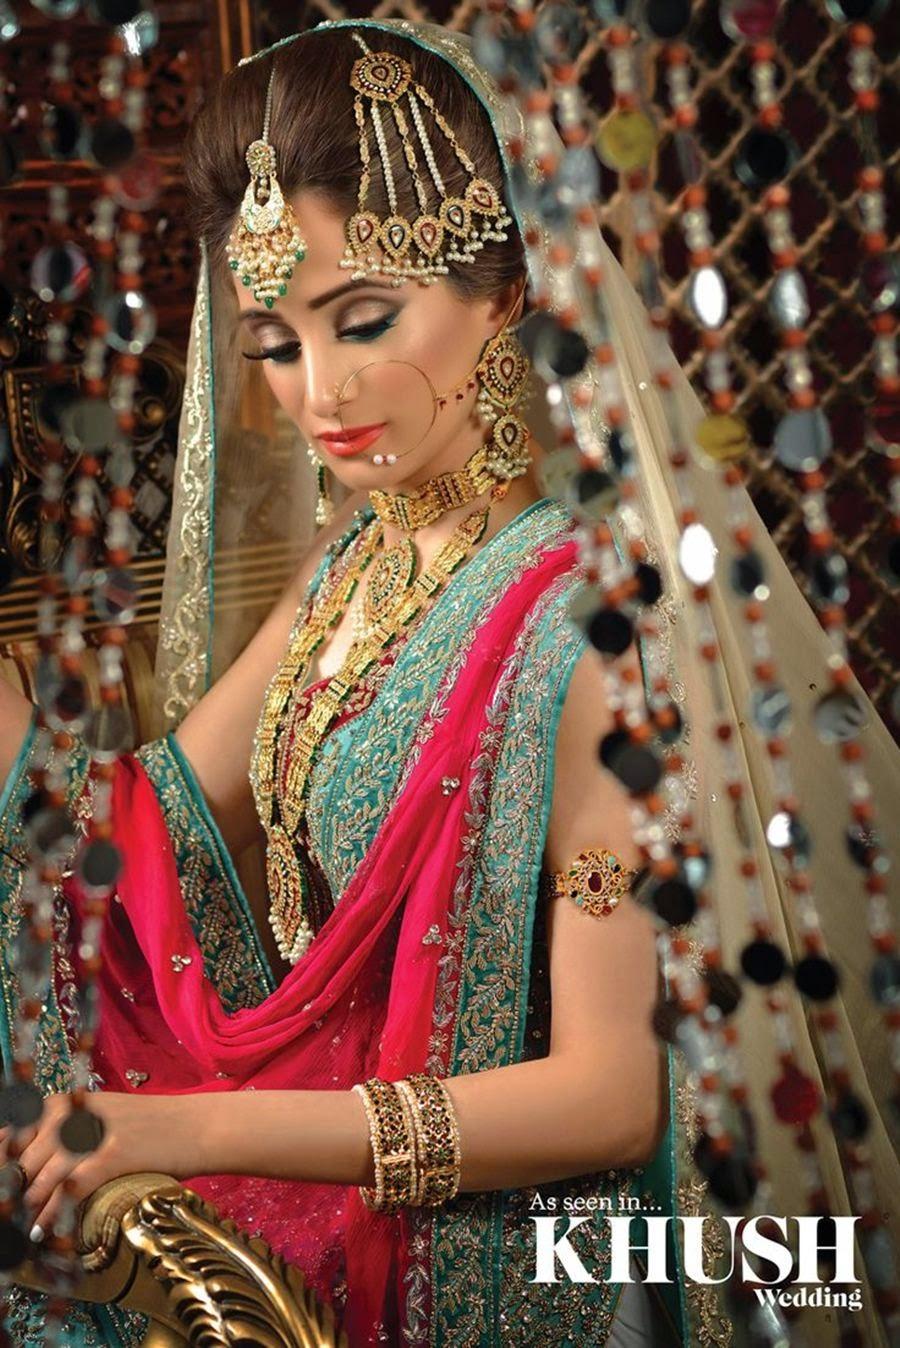 essay about pakistani wedding